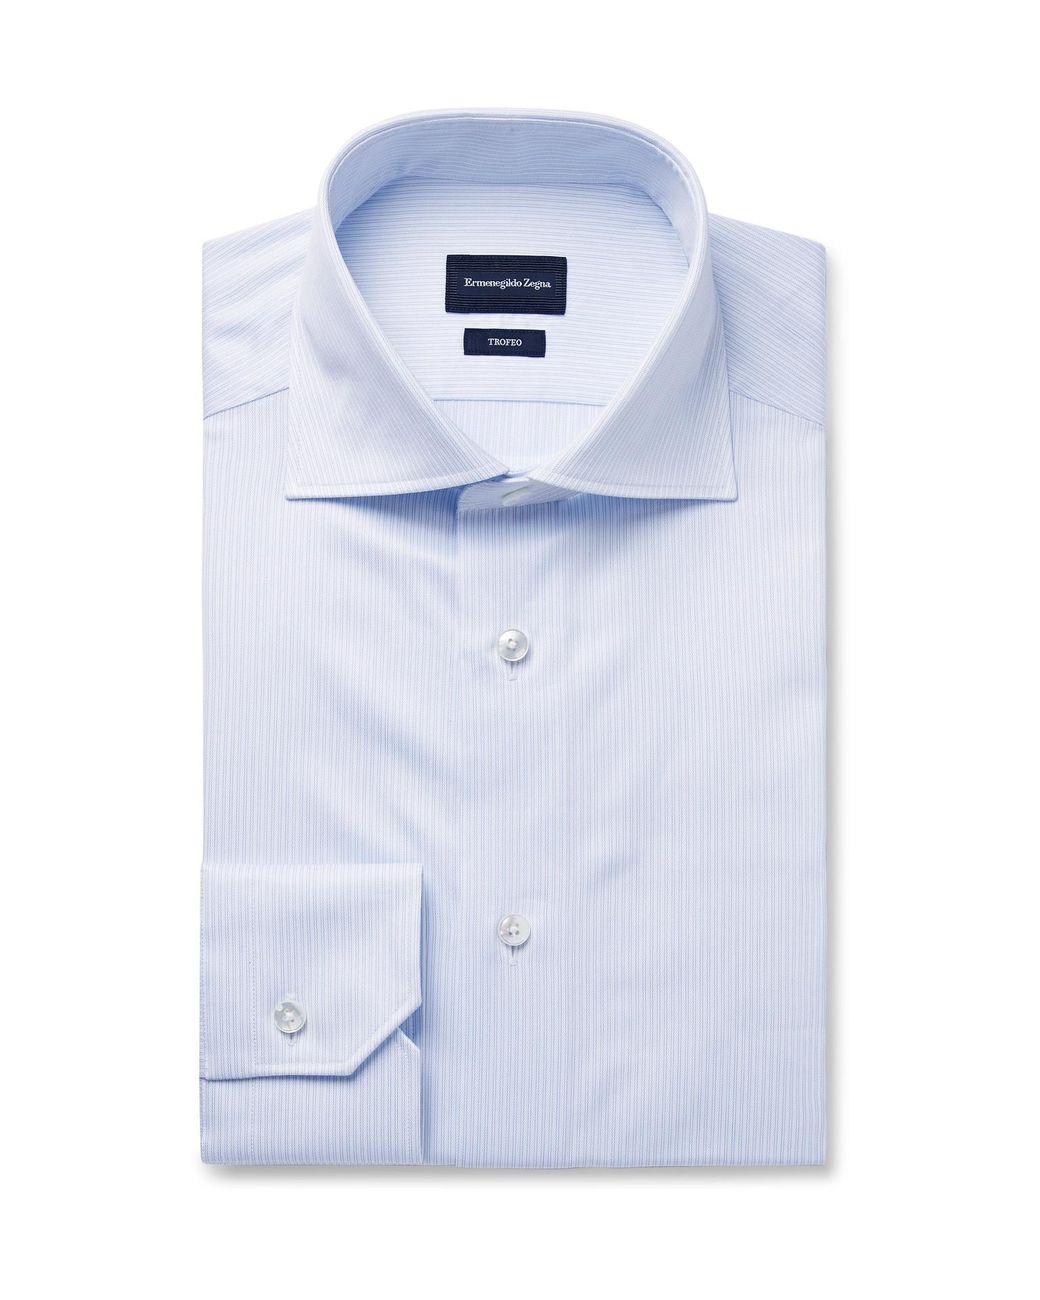 049ac4d6 Ermenegildo Zegna Blue Trofeo Slim-fit Cutaway-collar Pinstriped ...